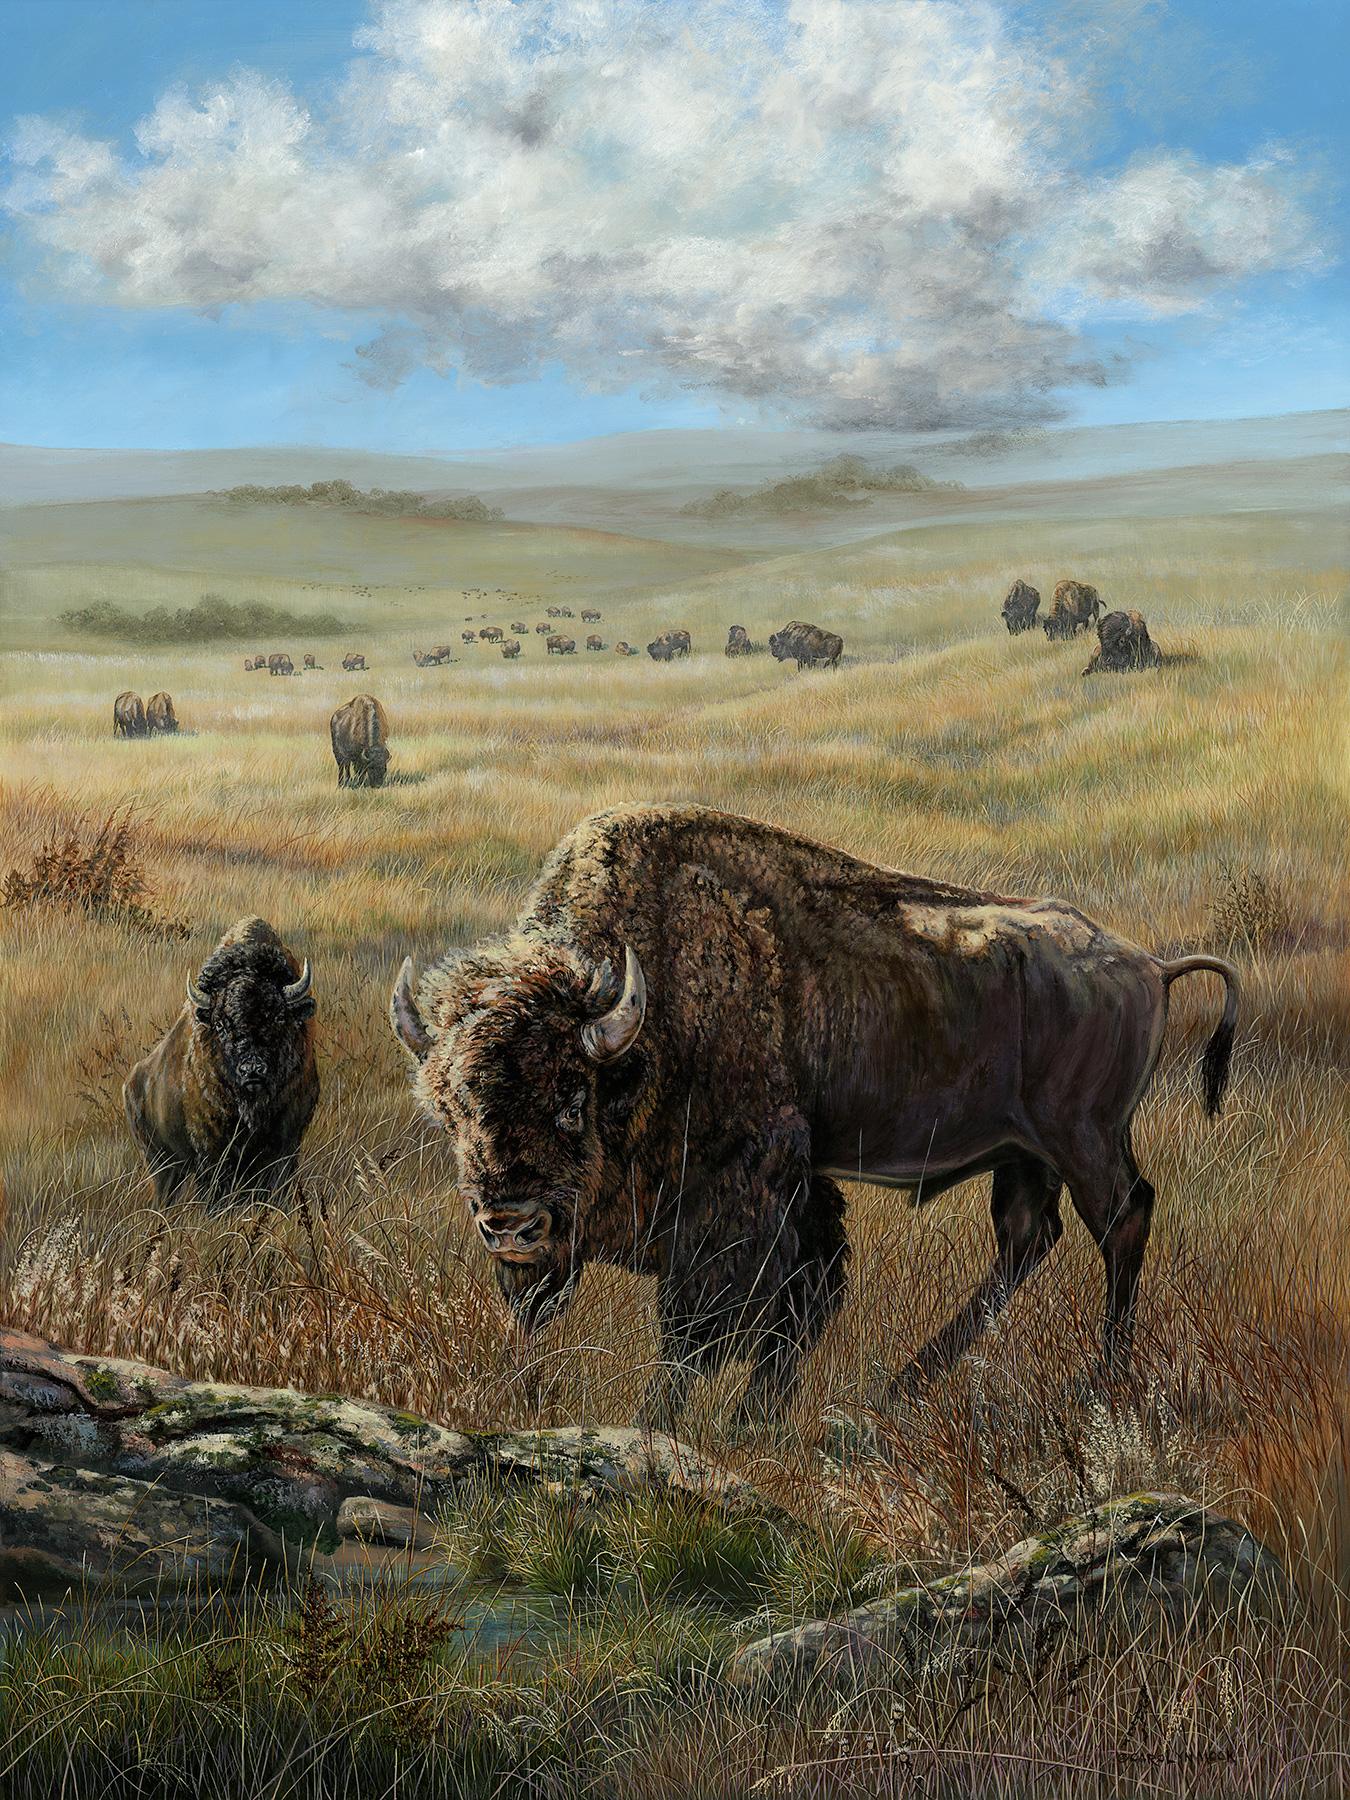 A herd of bison graze in a field